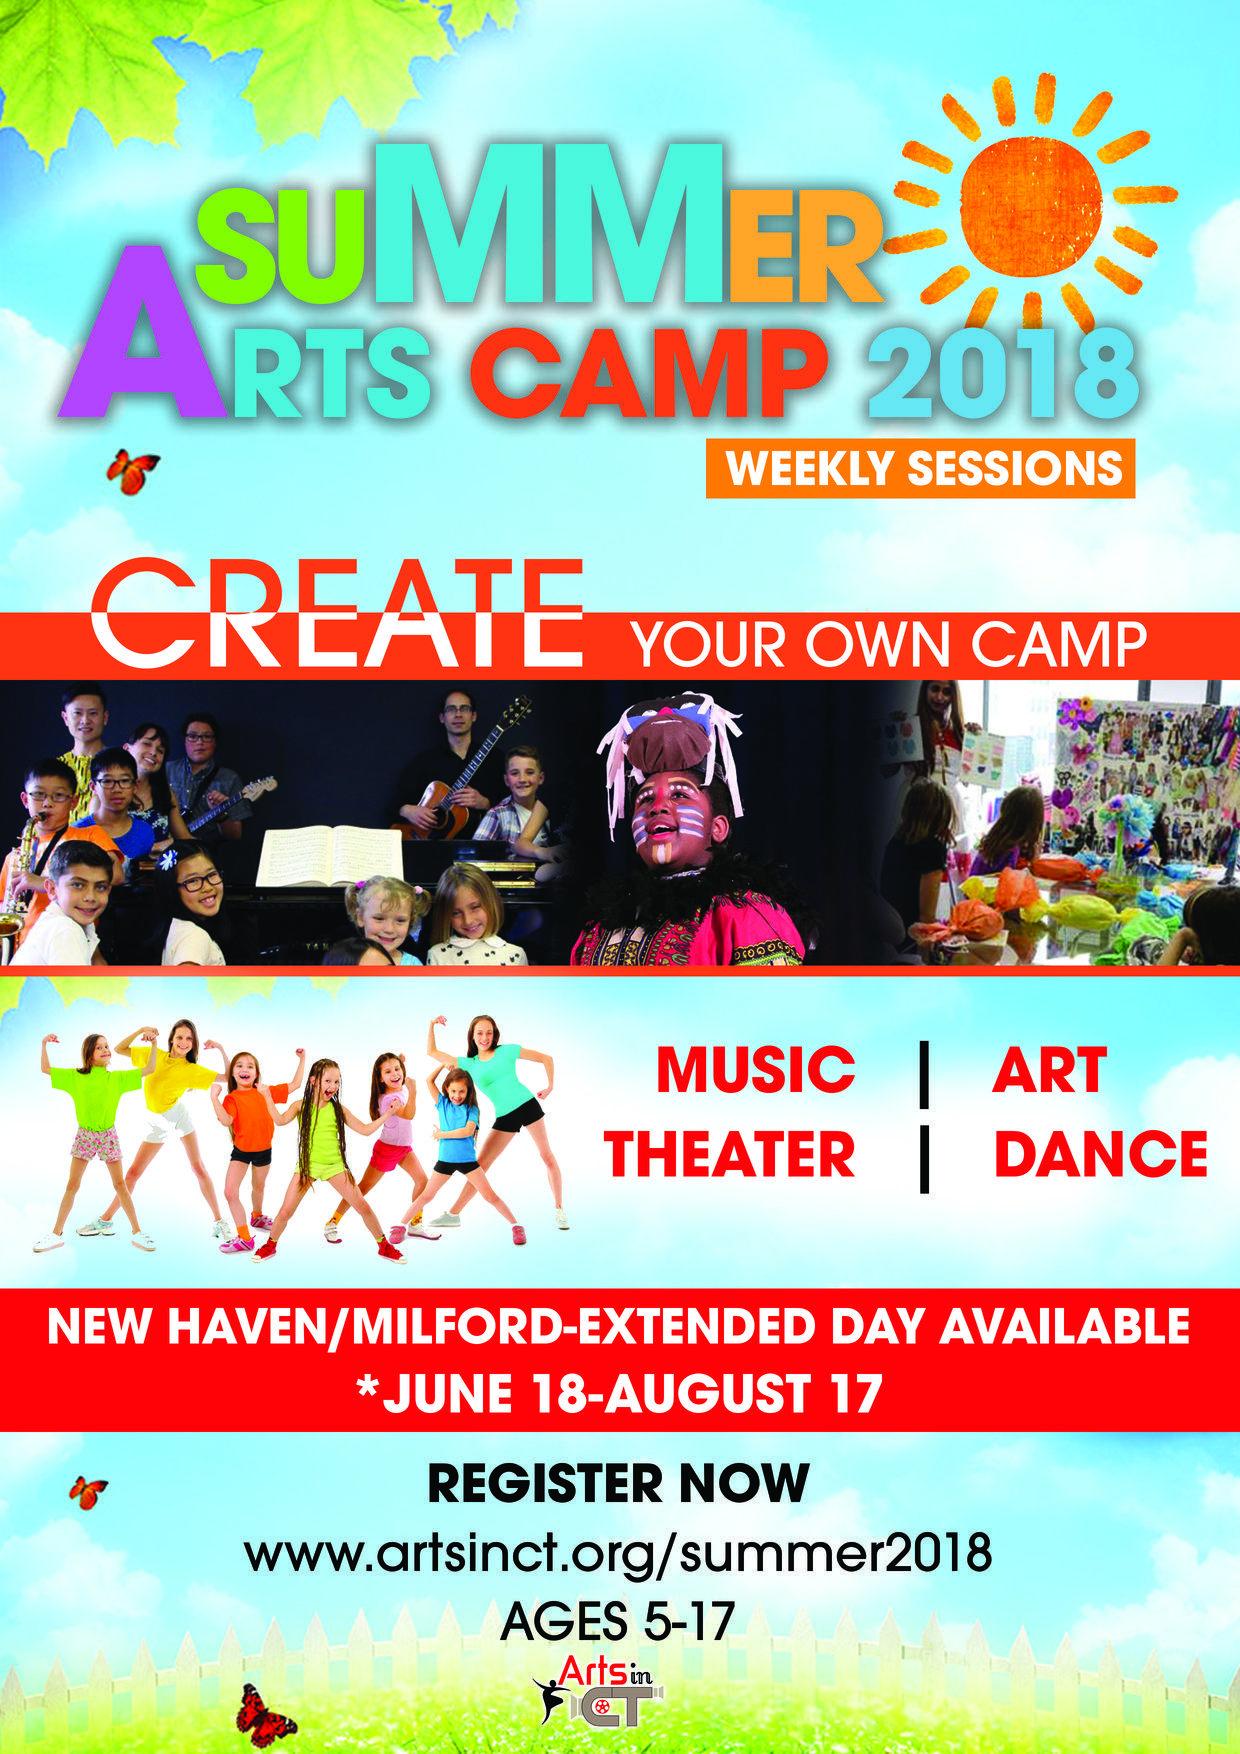 Summer Arts Camp 2018